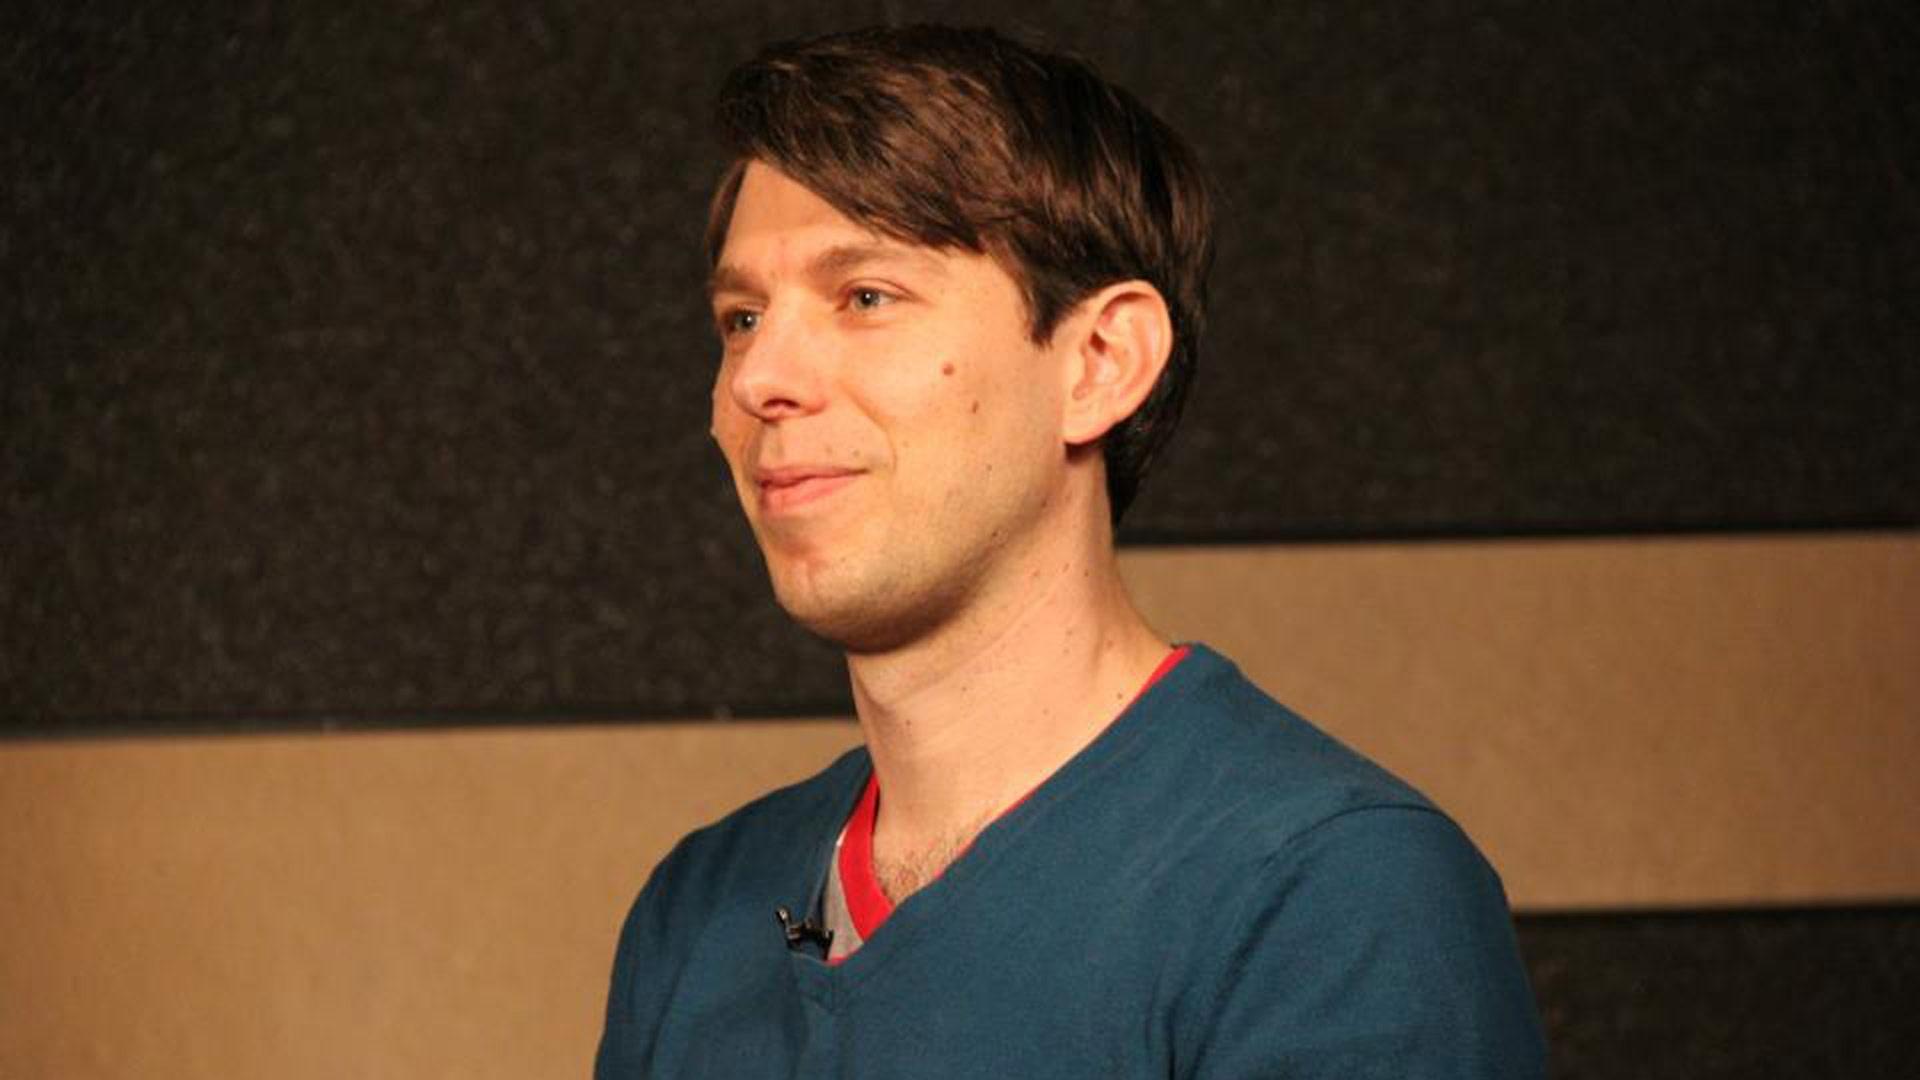 Neurotypical: Filmmaker Interview with Adam Larsen